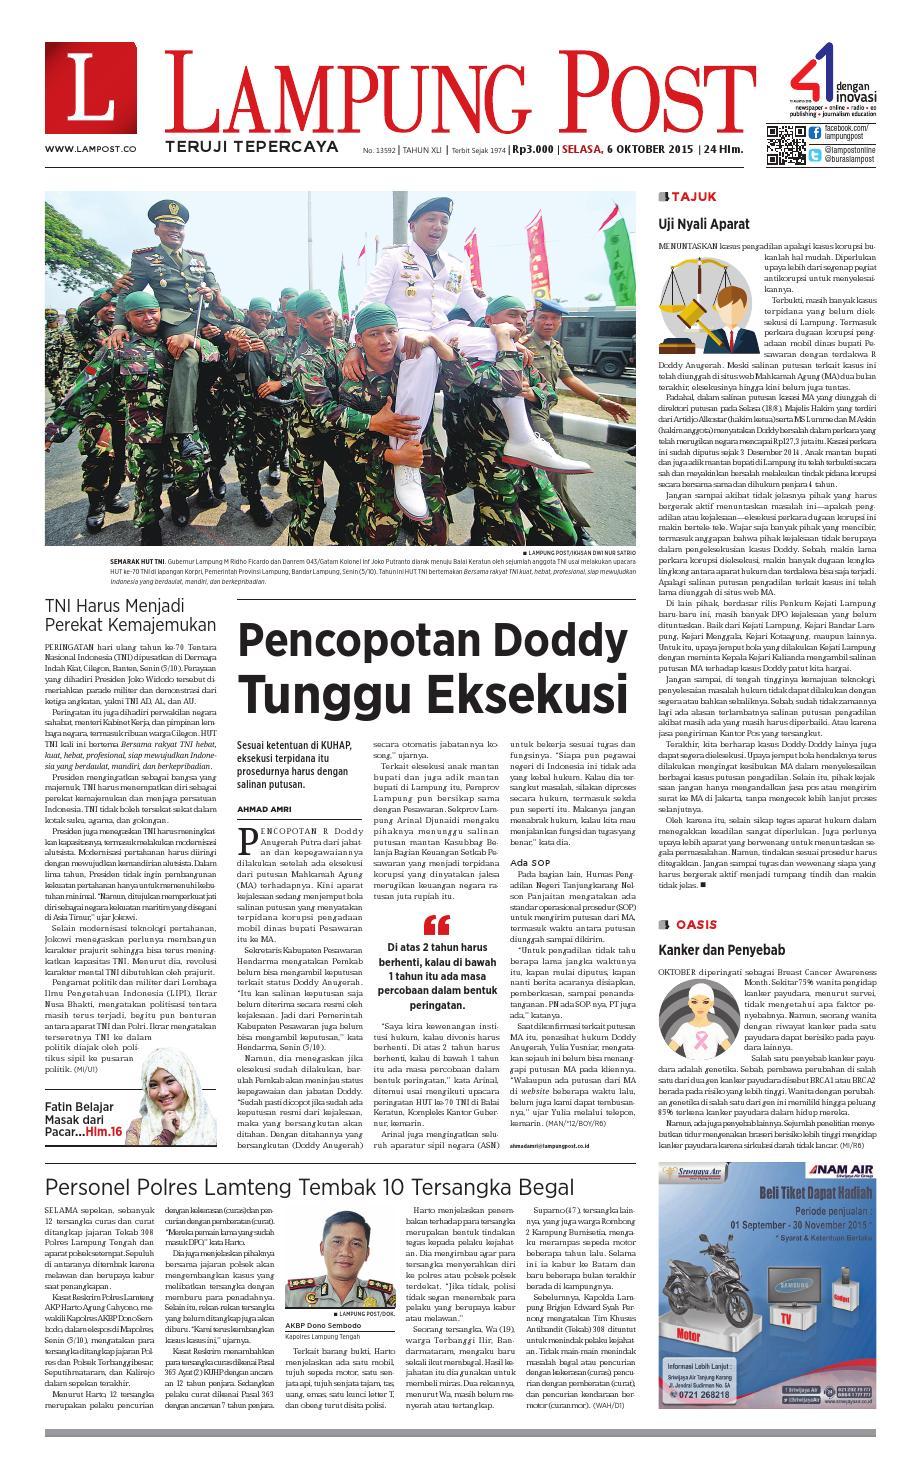 Lampung Post Selasa 6 Oktober 2015 By Issuu Produk Ukm Bumn Sulam Usus Pmk